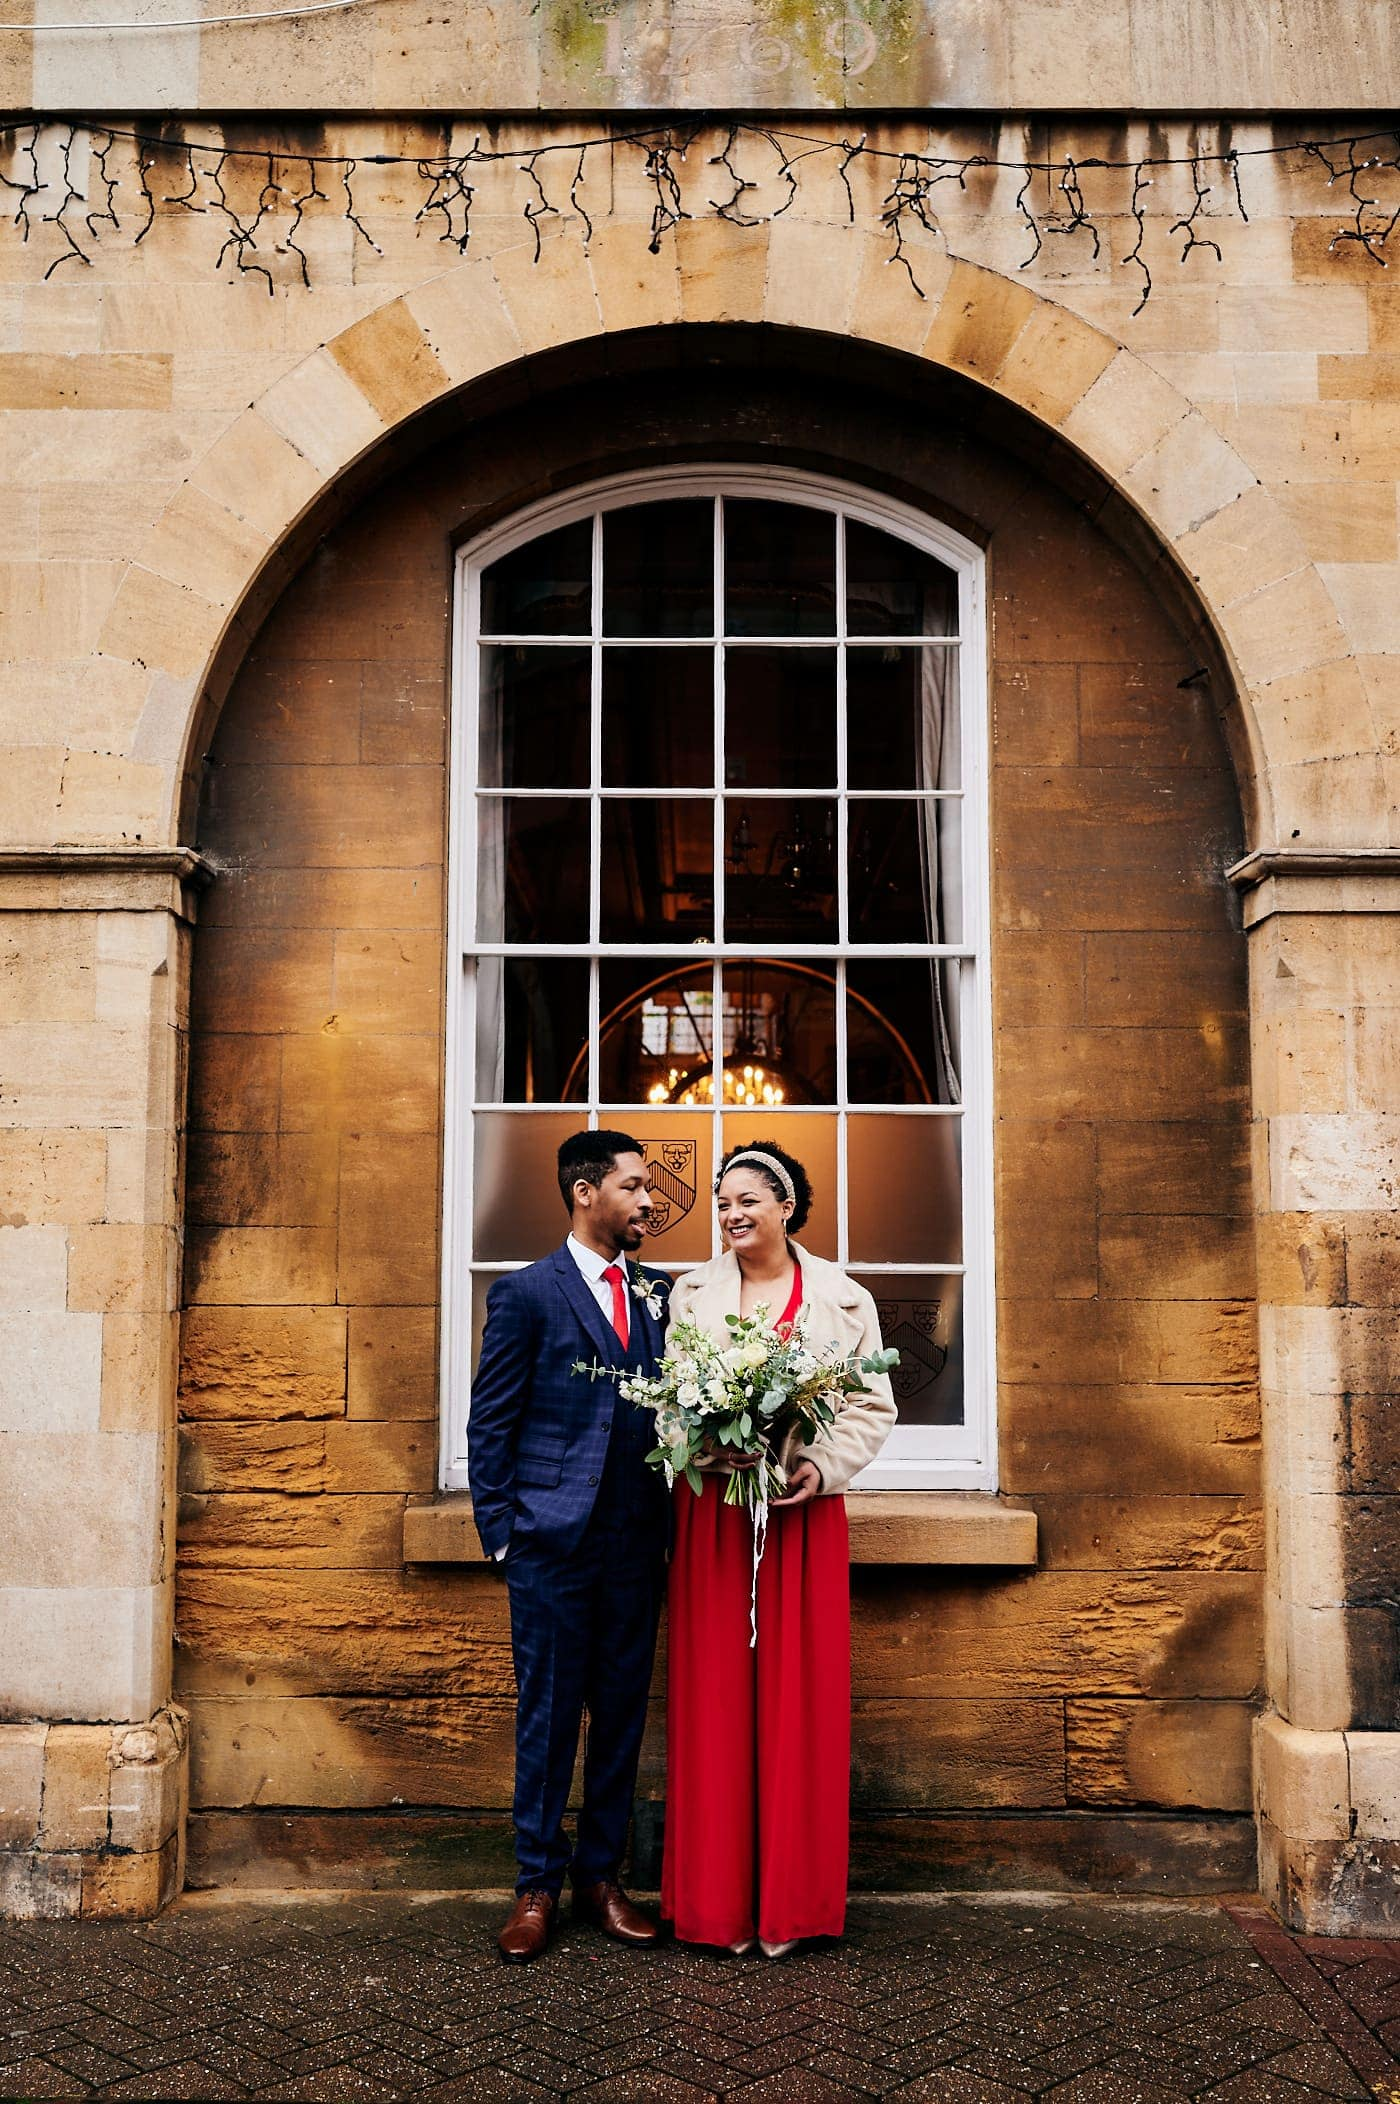 Bride and groom under archway in Stratford-upon-Avon